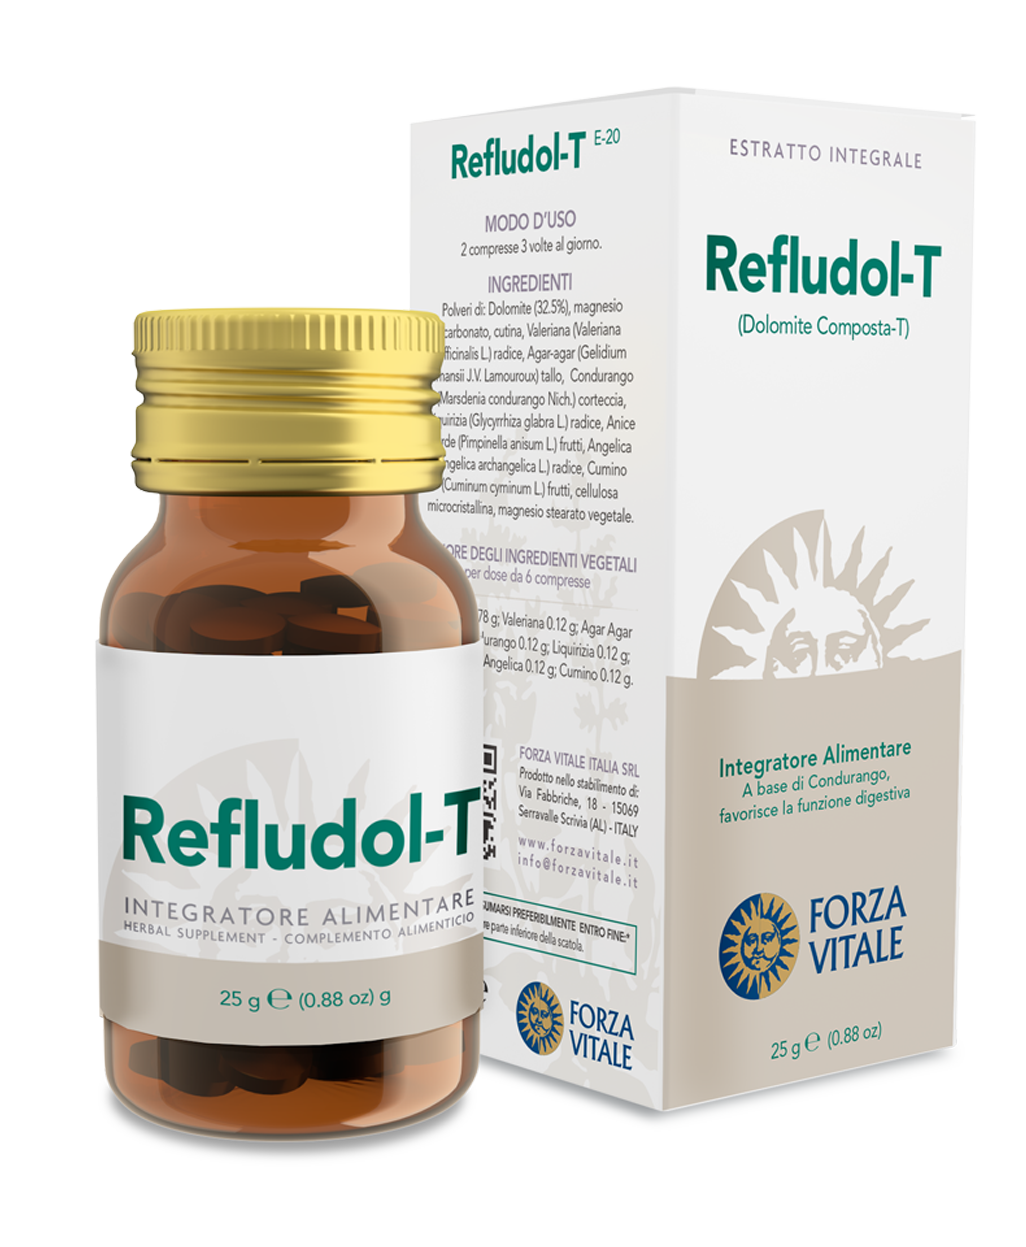 REFLUDOL-T 25G